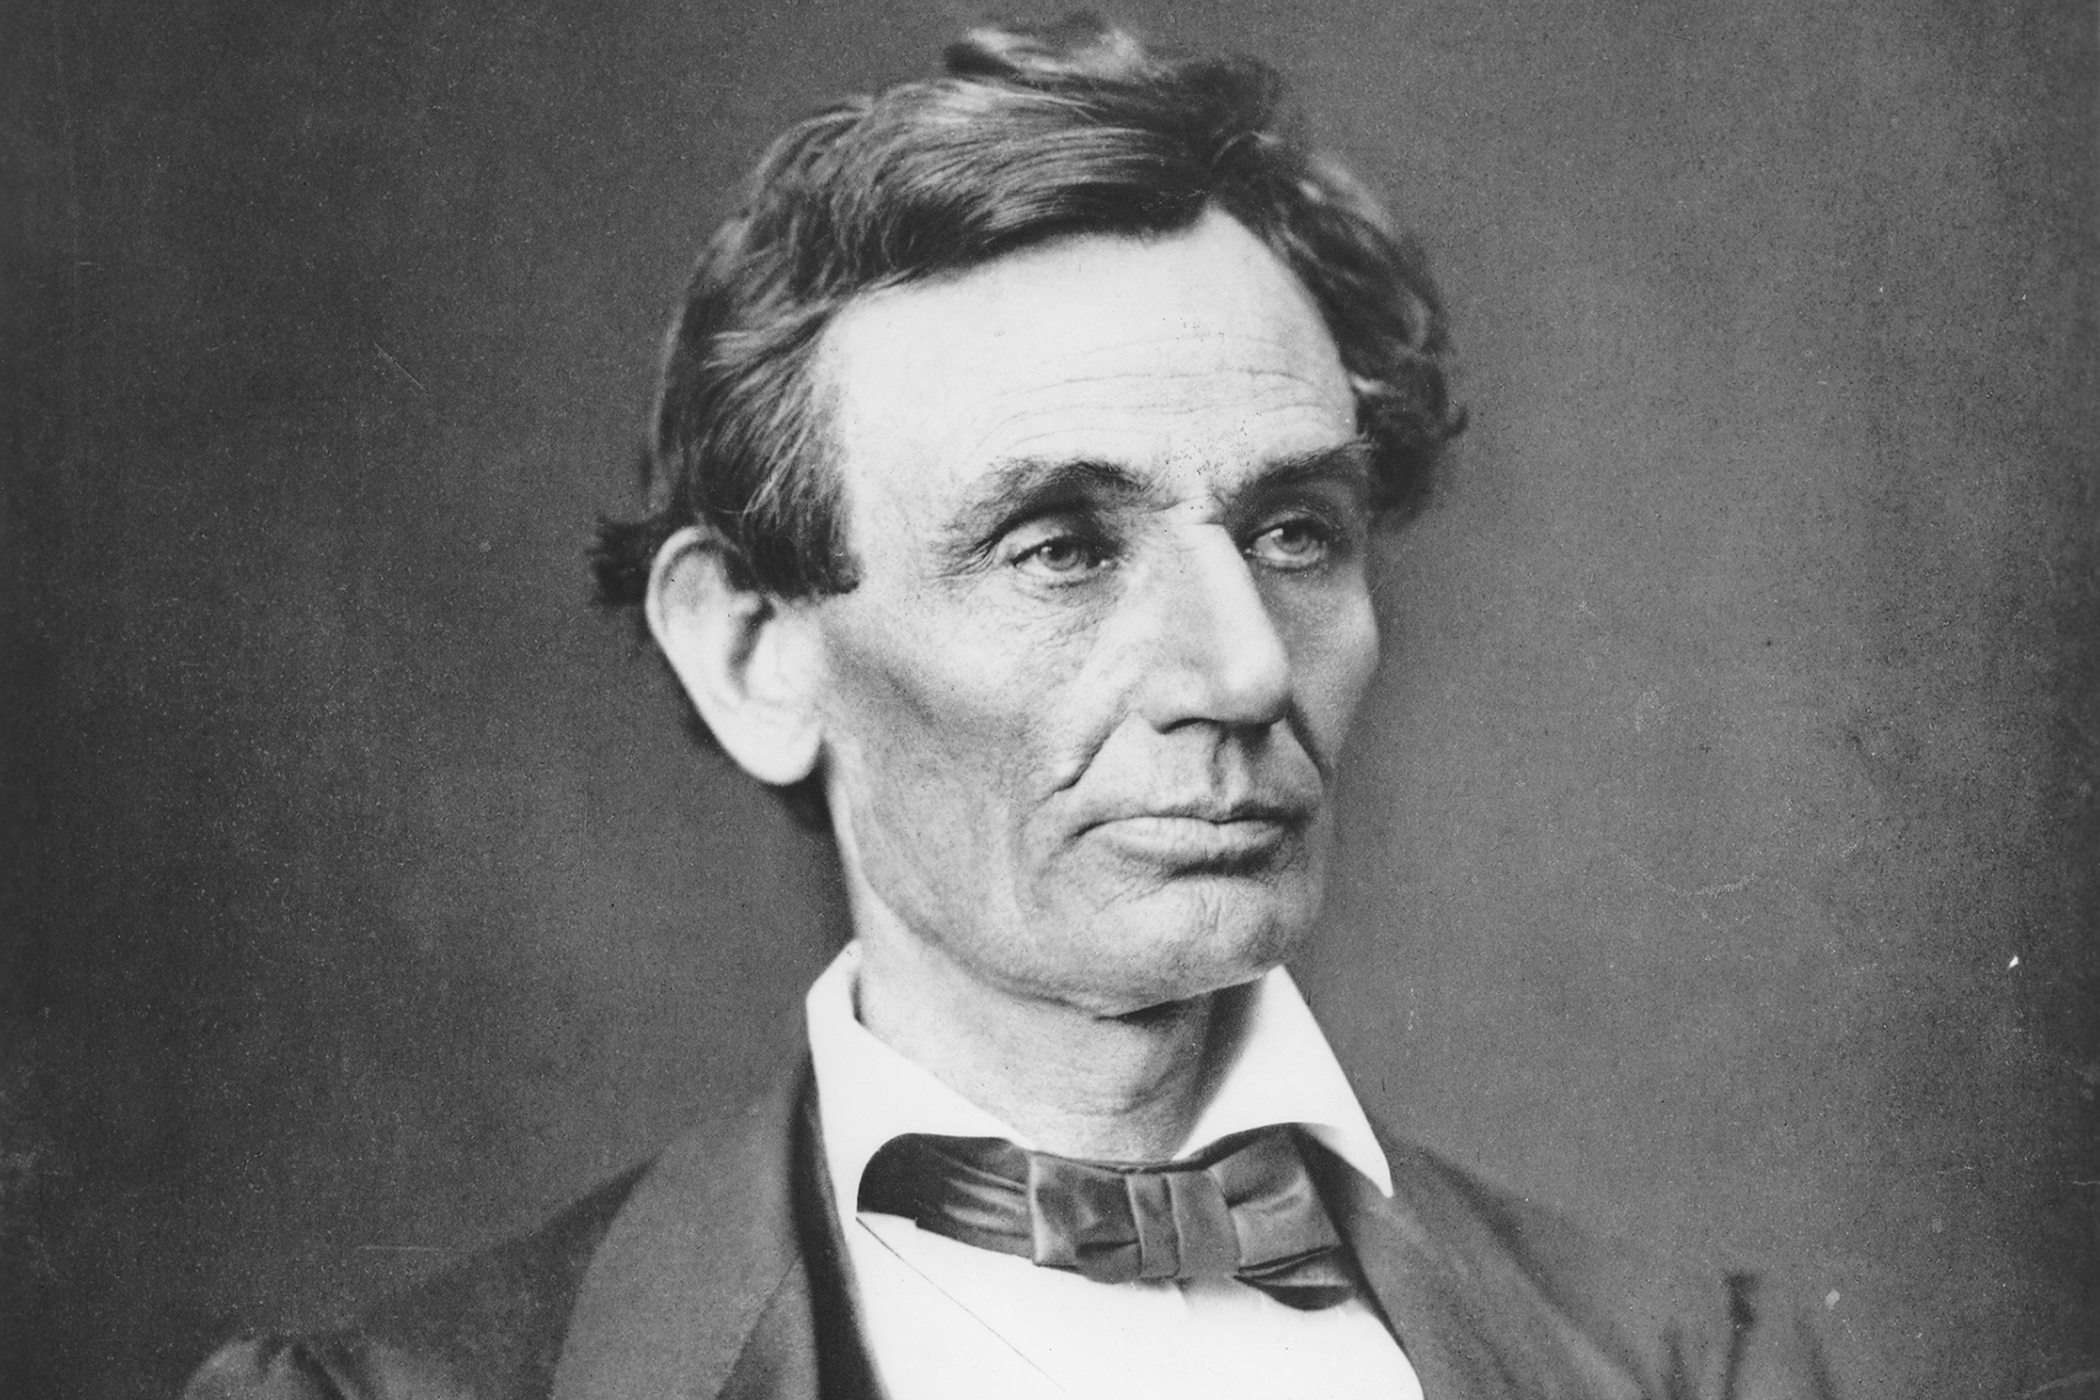 Legacy Of Abraham Lincoln 22 Desktop Wallpaper   Hot 2100x1400